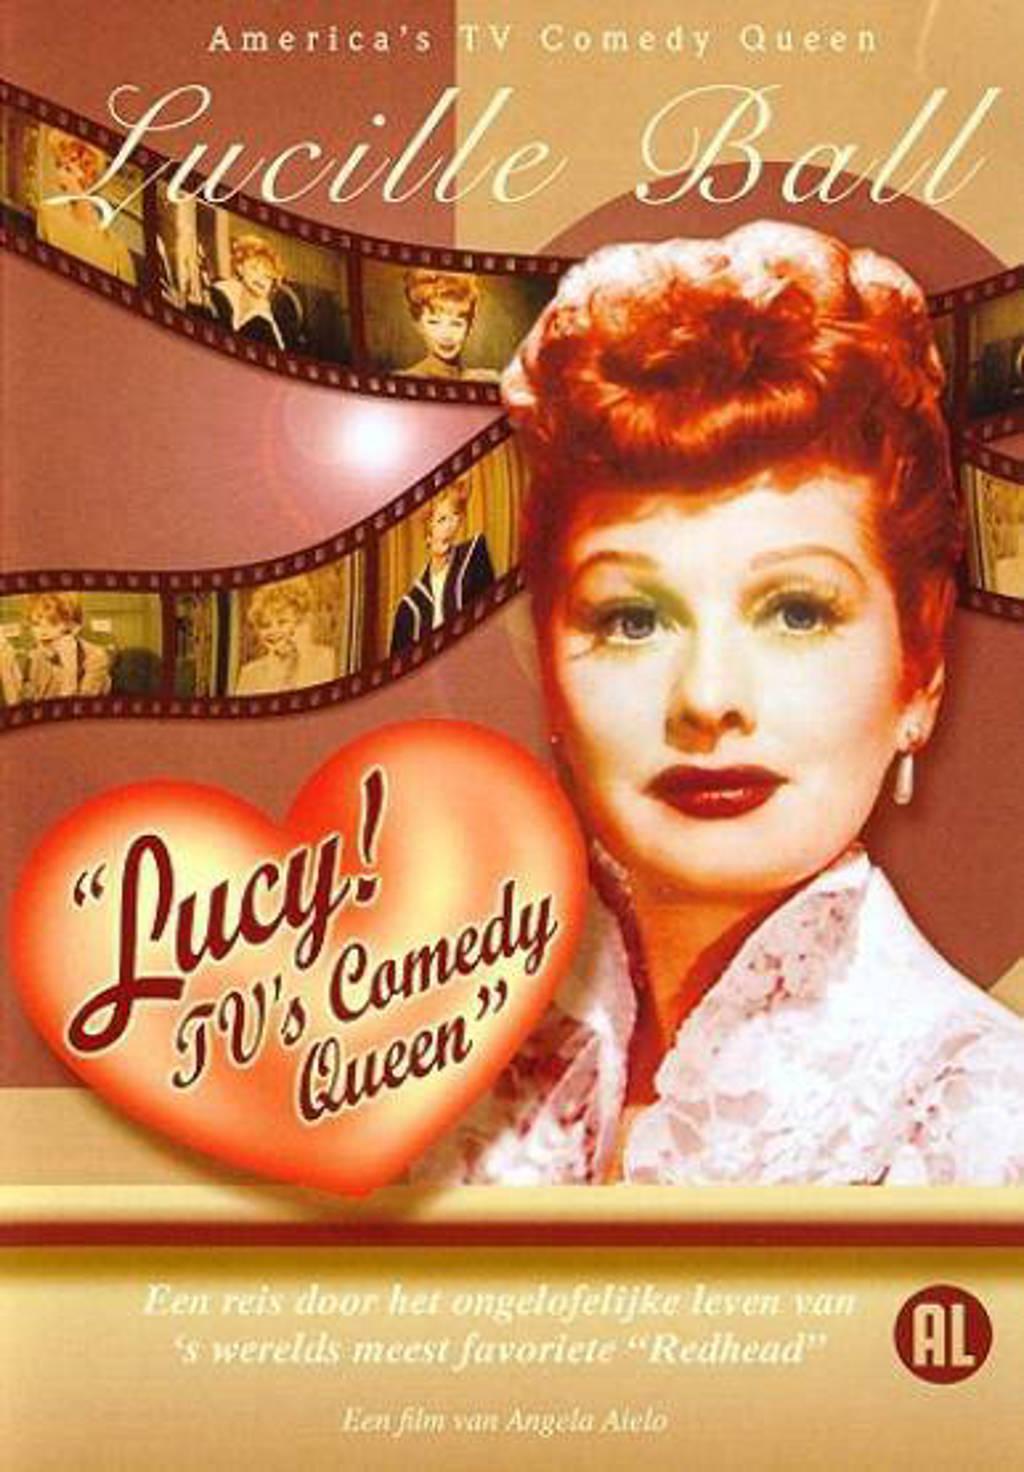 Lucy - tv's comedy queen (DVD)